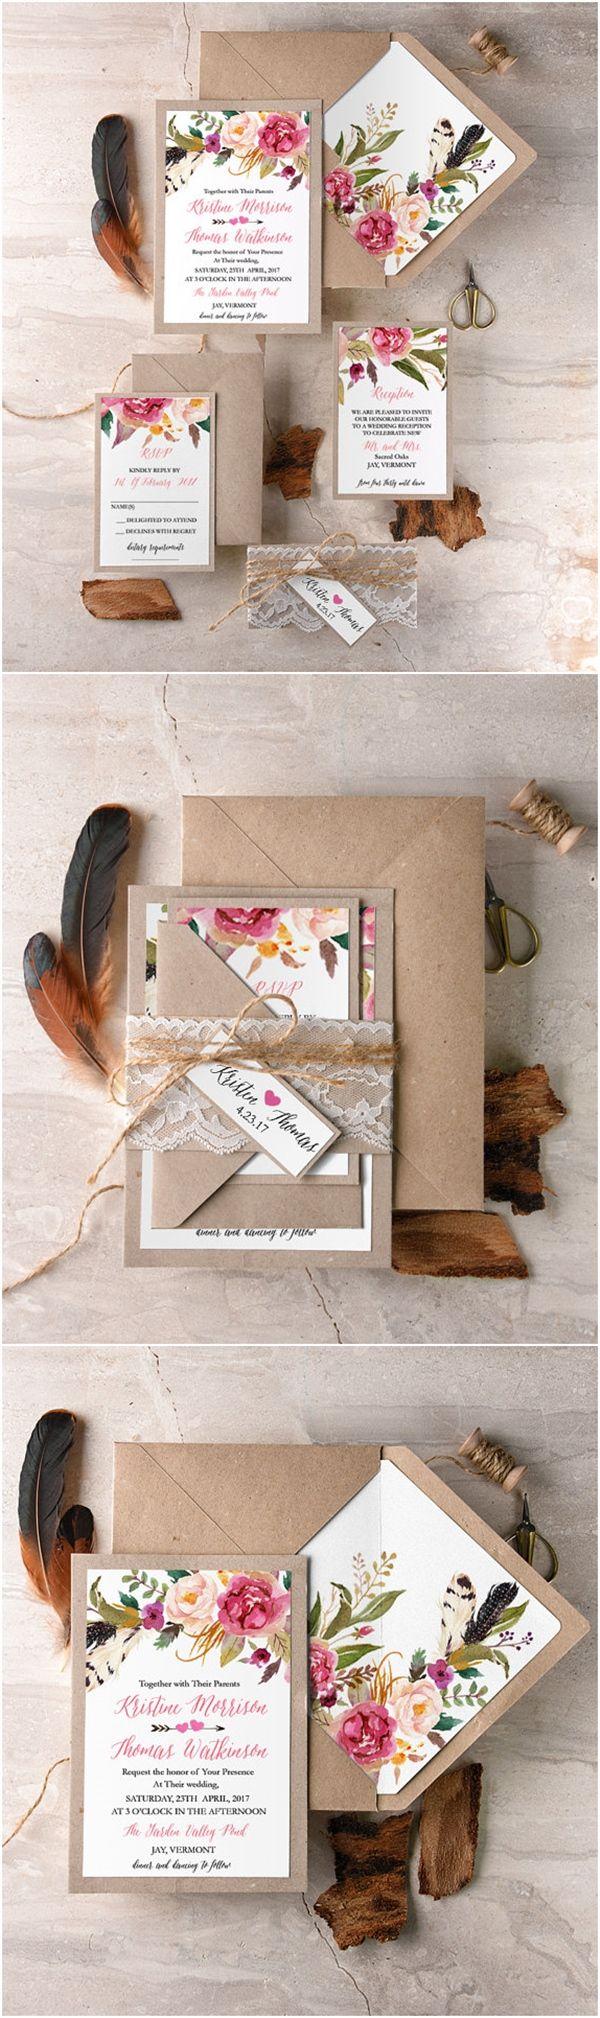 Rustic Boho Watercolor Feather Wedding Invitations